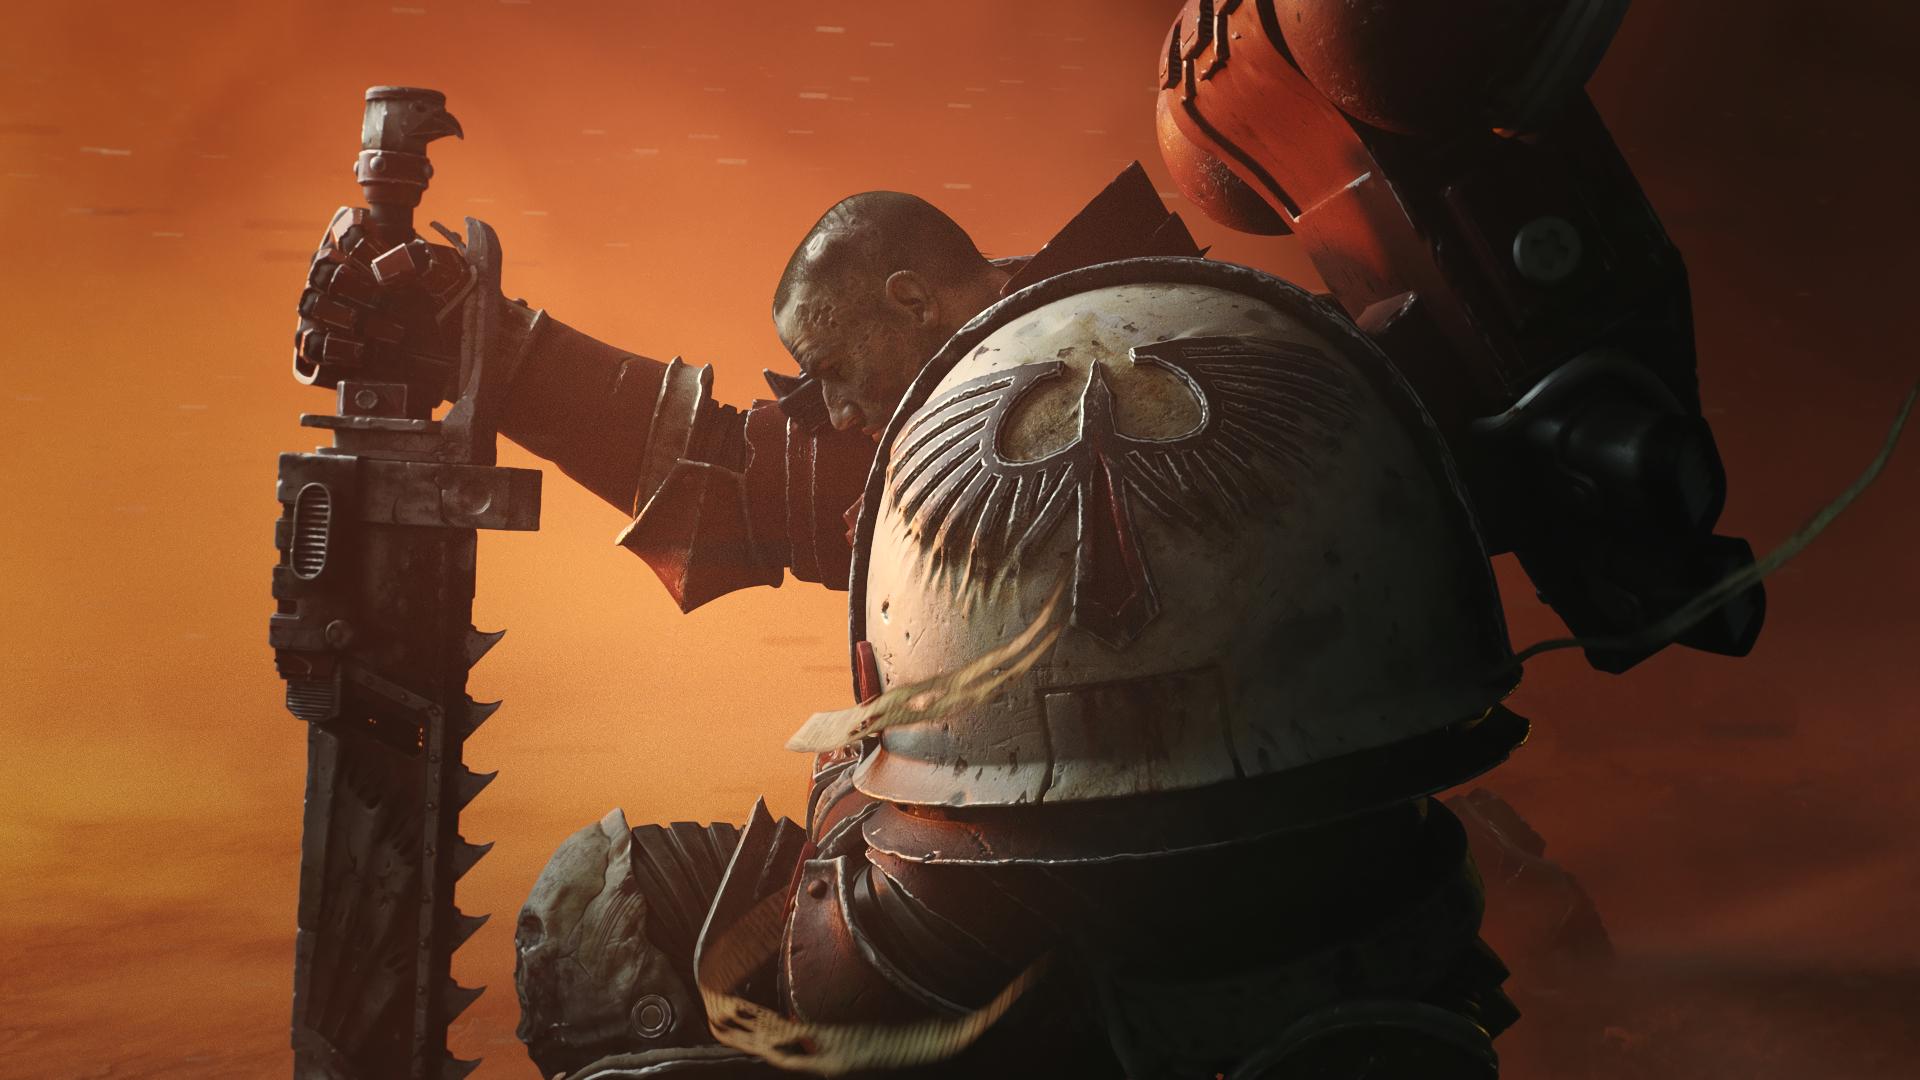 General 1920x1080 Dawn of War 3 Warhammer 40,000 fantasy art Space Marine